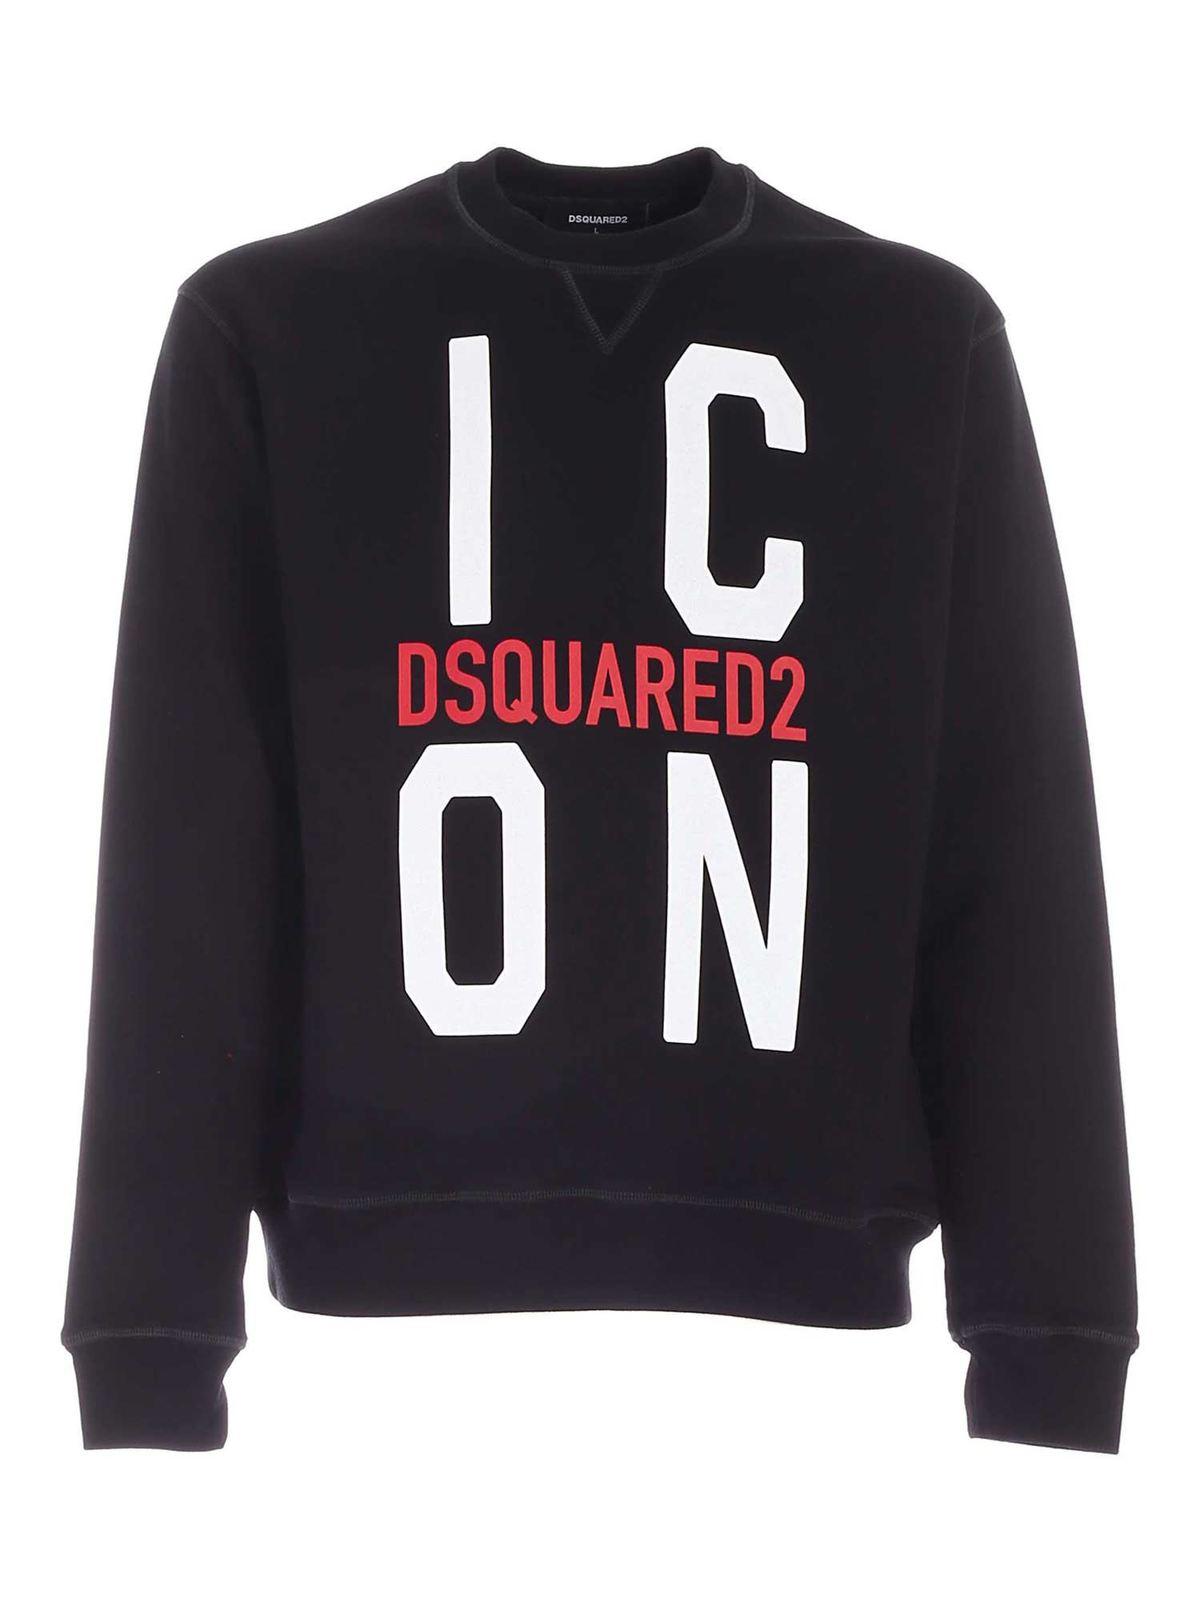 Dsquared2 Logo Printed Sweatshirt In Black